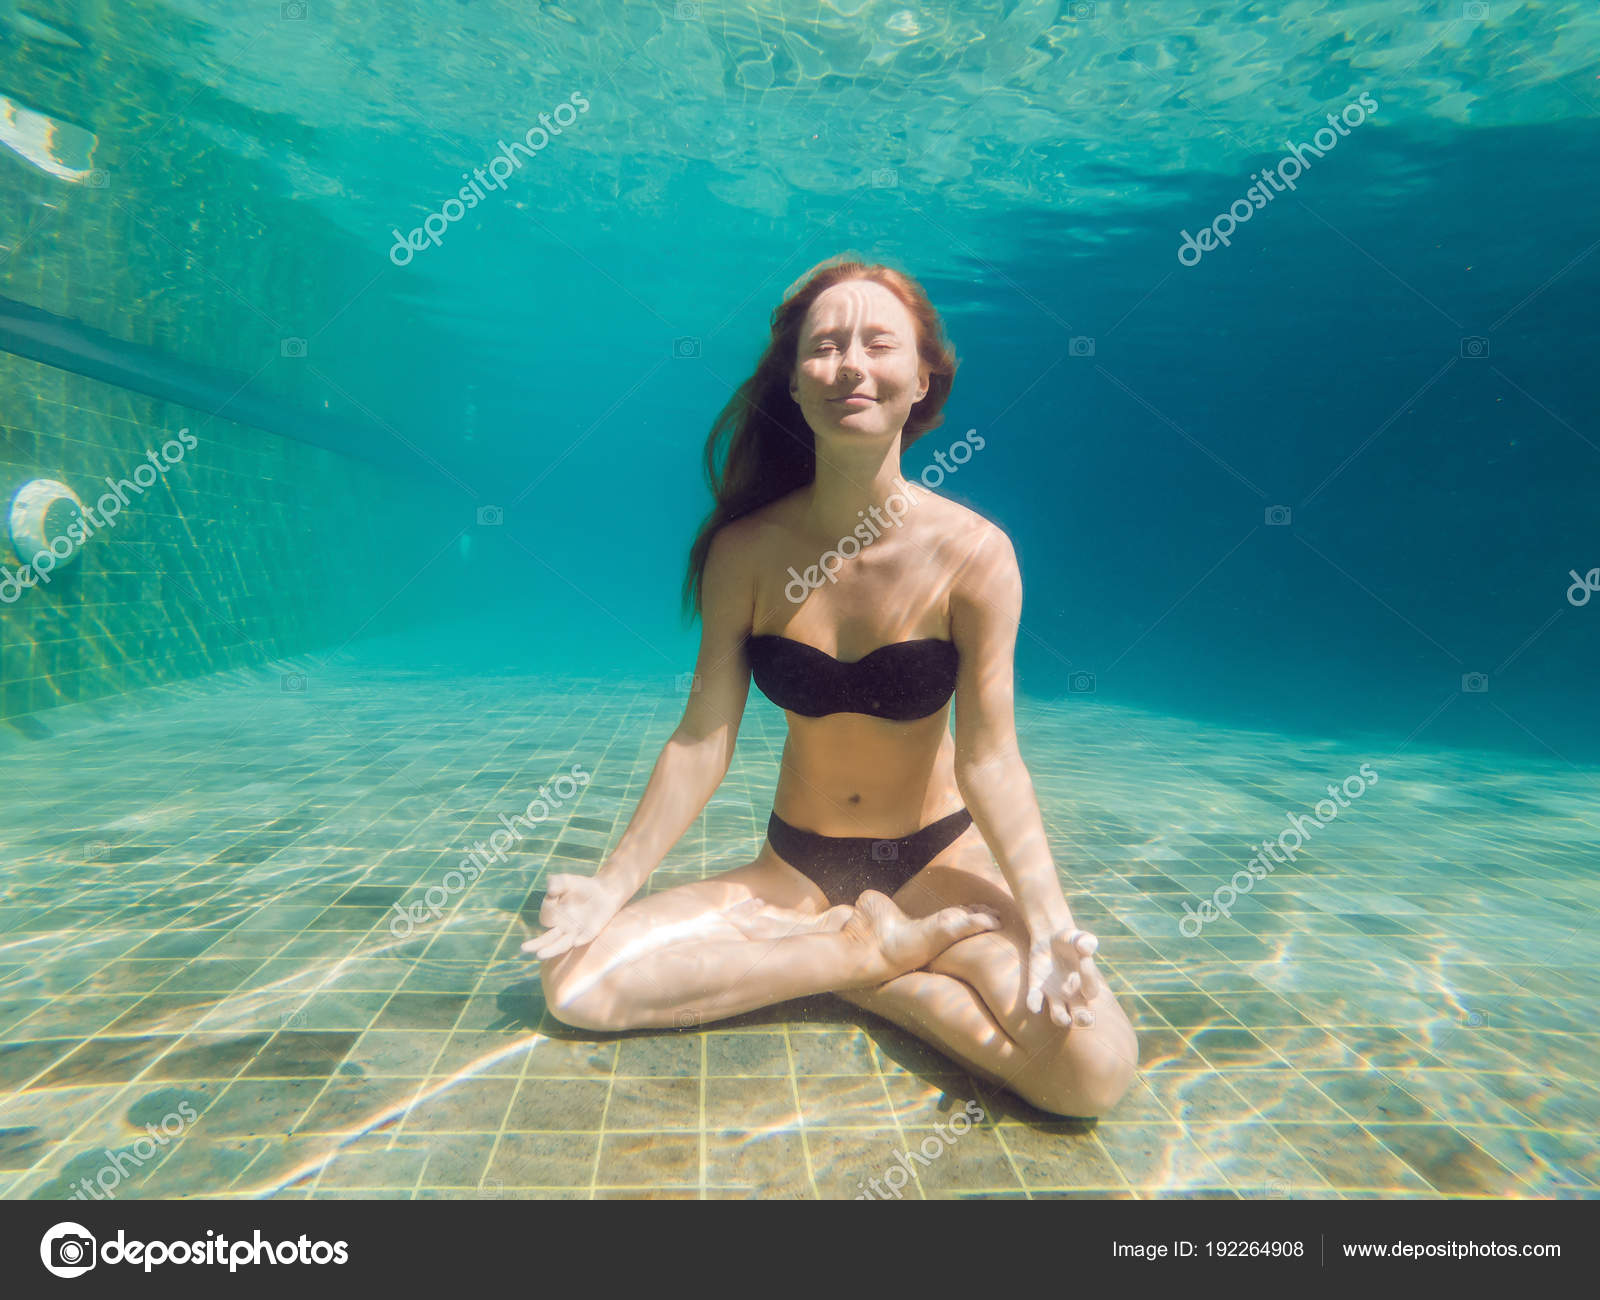 Young Woman Black Bikini Yoga Position Underwater Diving Aquarium Full —  Stock Photo